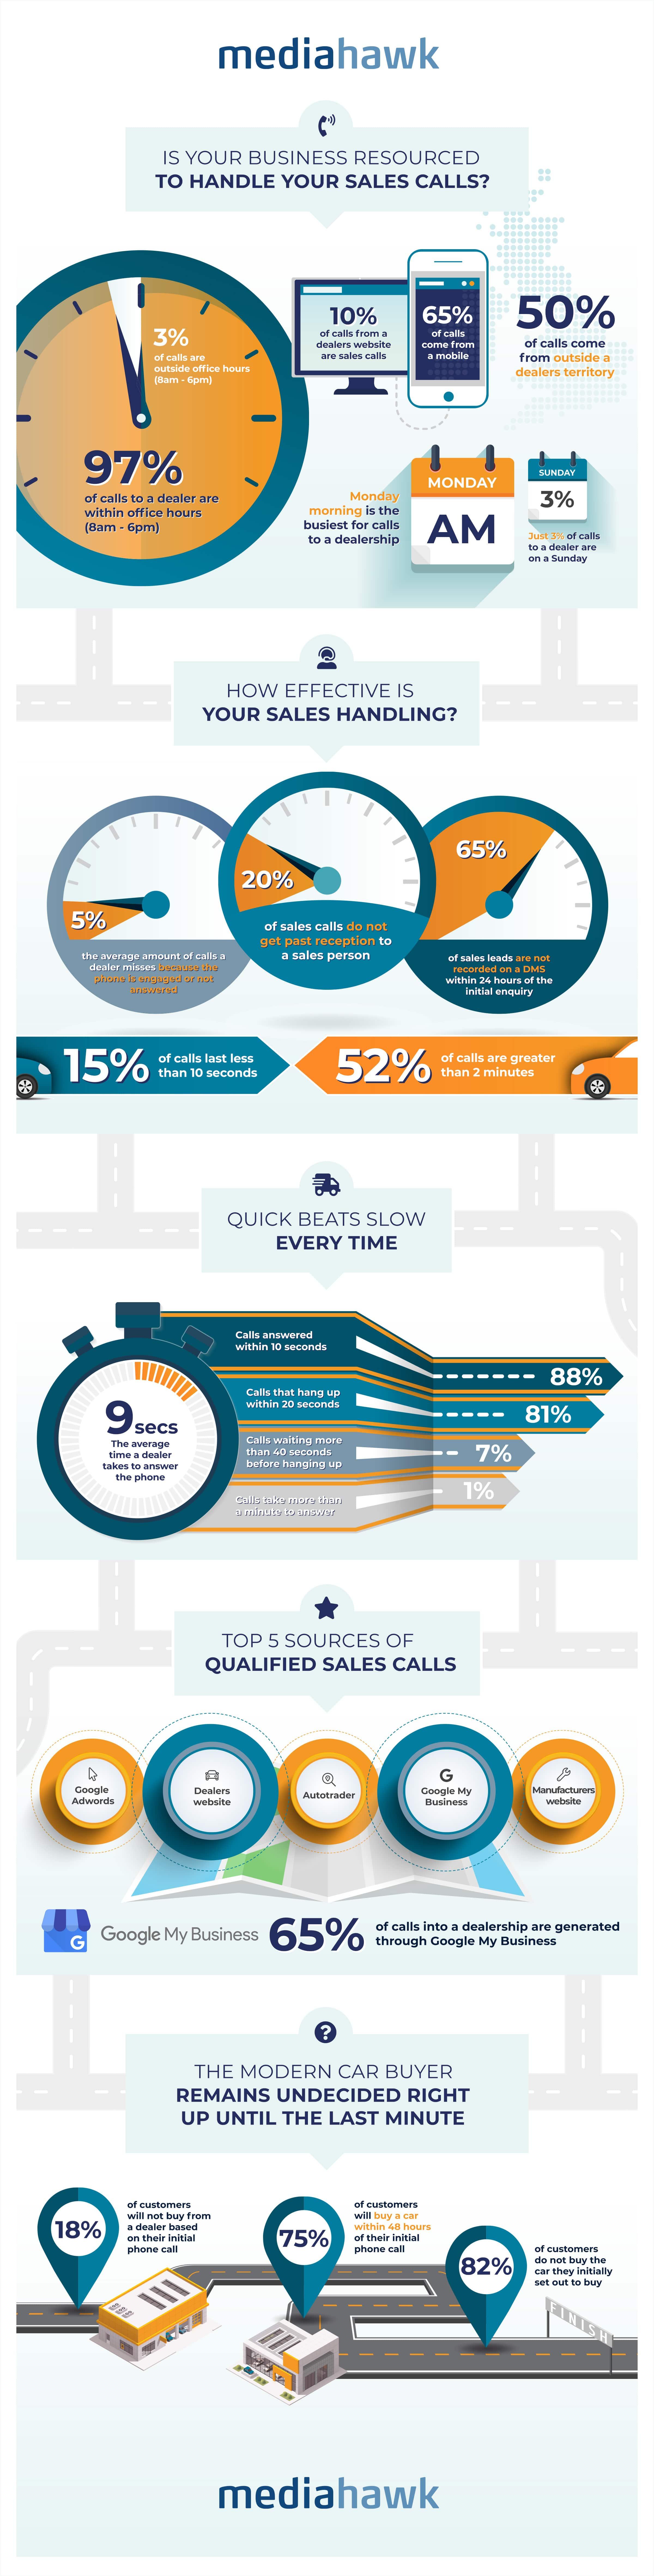 Automotive infographic - Mediahawk.